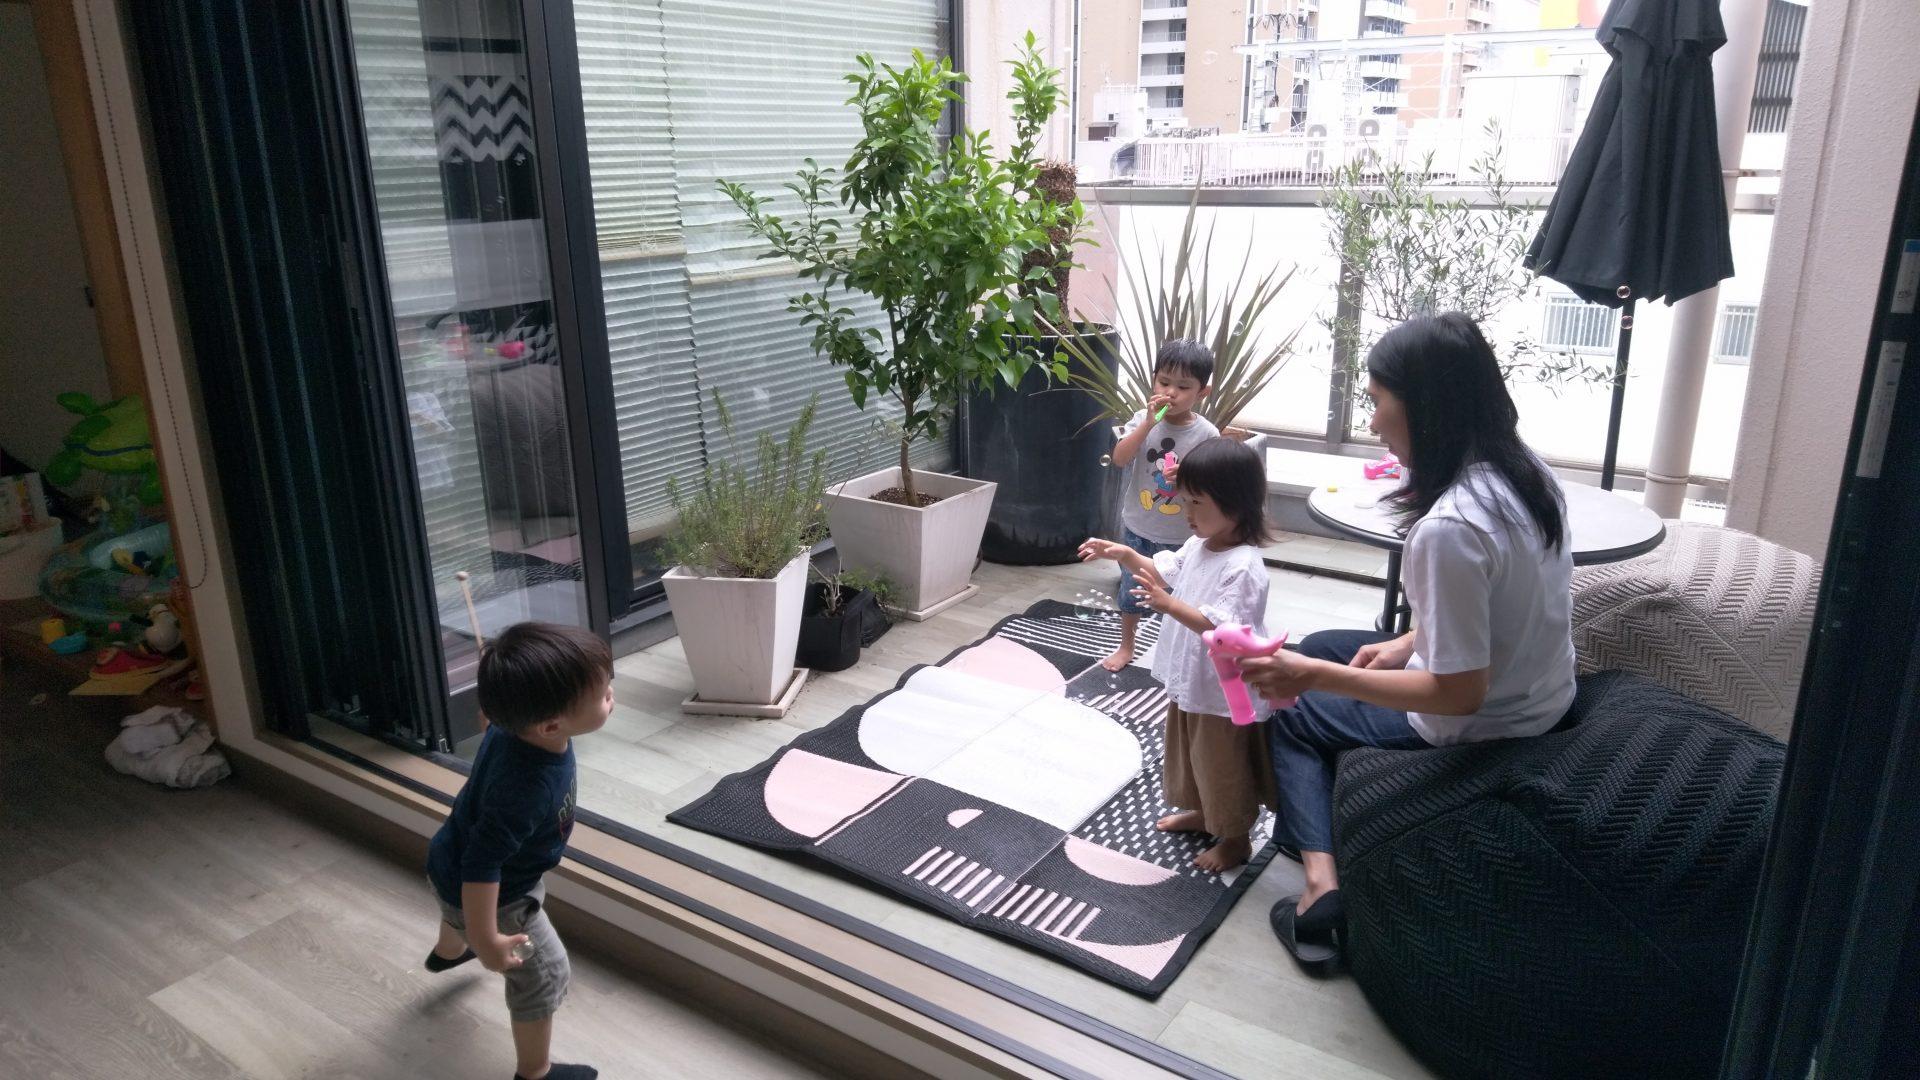 PDM洗えるRUG 展示 販売 大阪マルキン家具